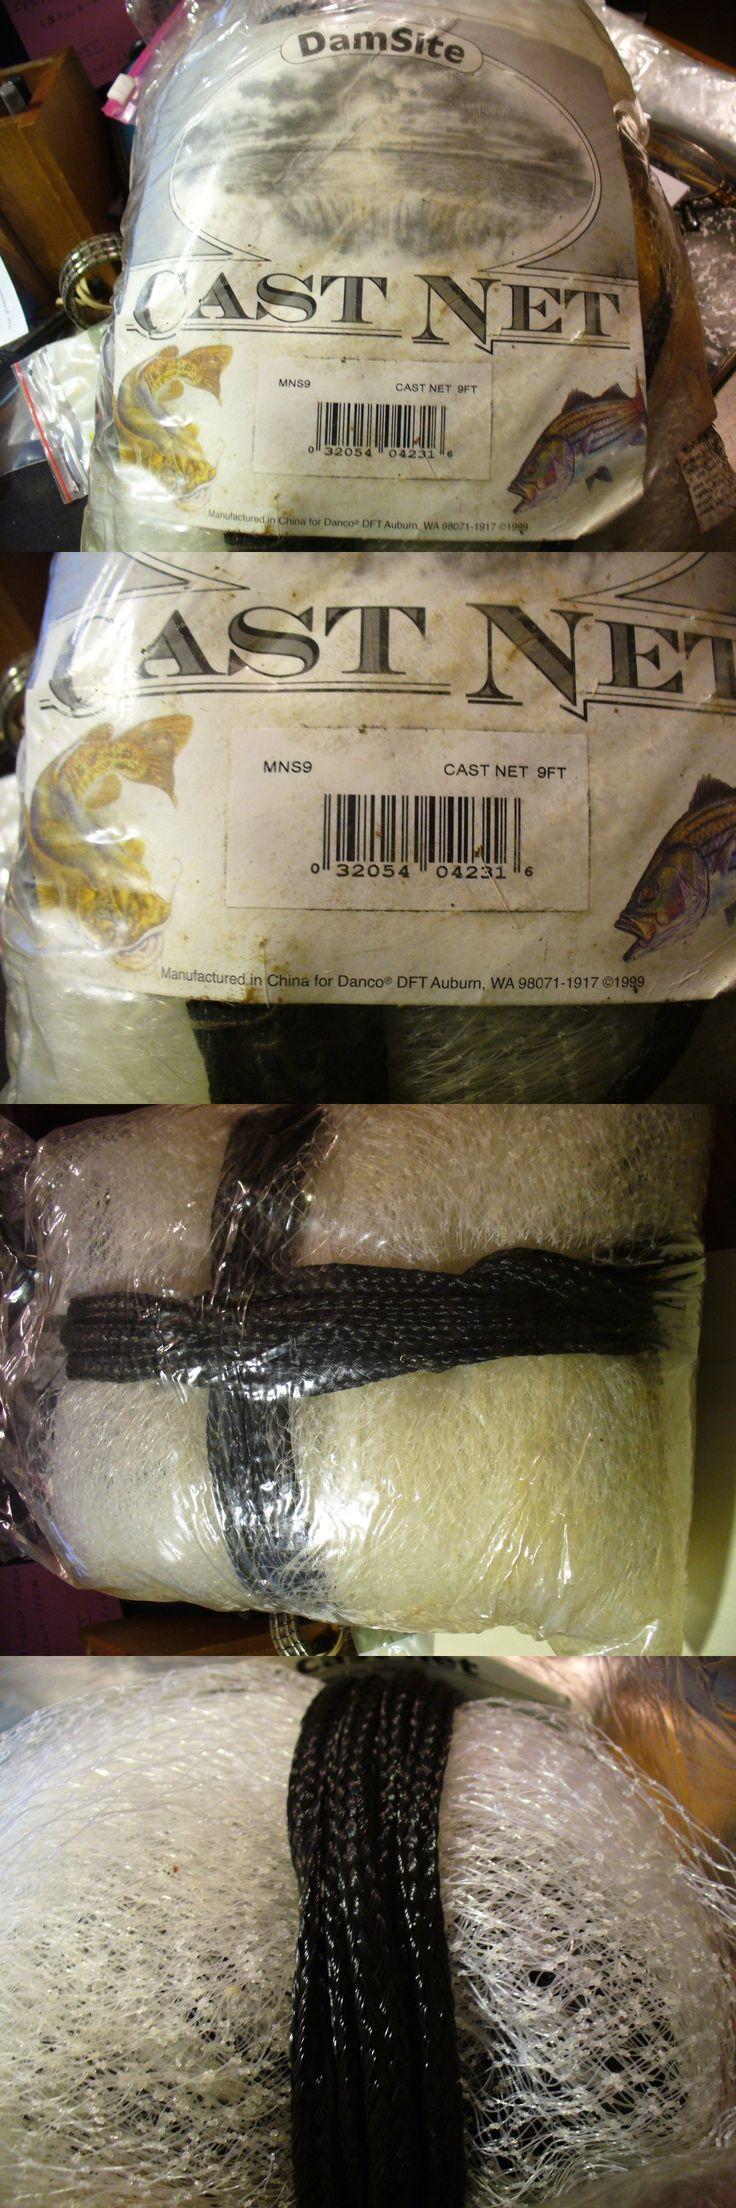 Nets 81458: Danco 9 Ft Cast Throw Fishing Net-18 Ft Diameter 3 8 Mono Square Mesh -> BUY IT NOW ONLY: $54.99 on eBay!